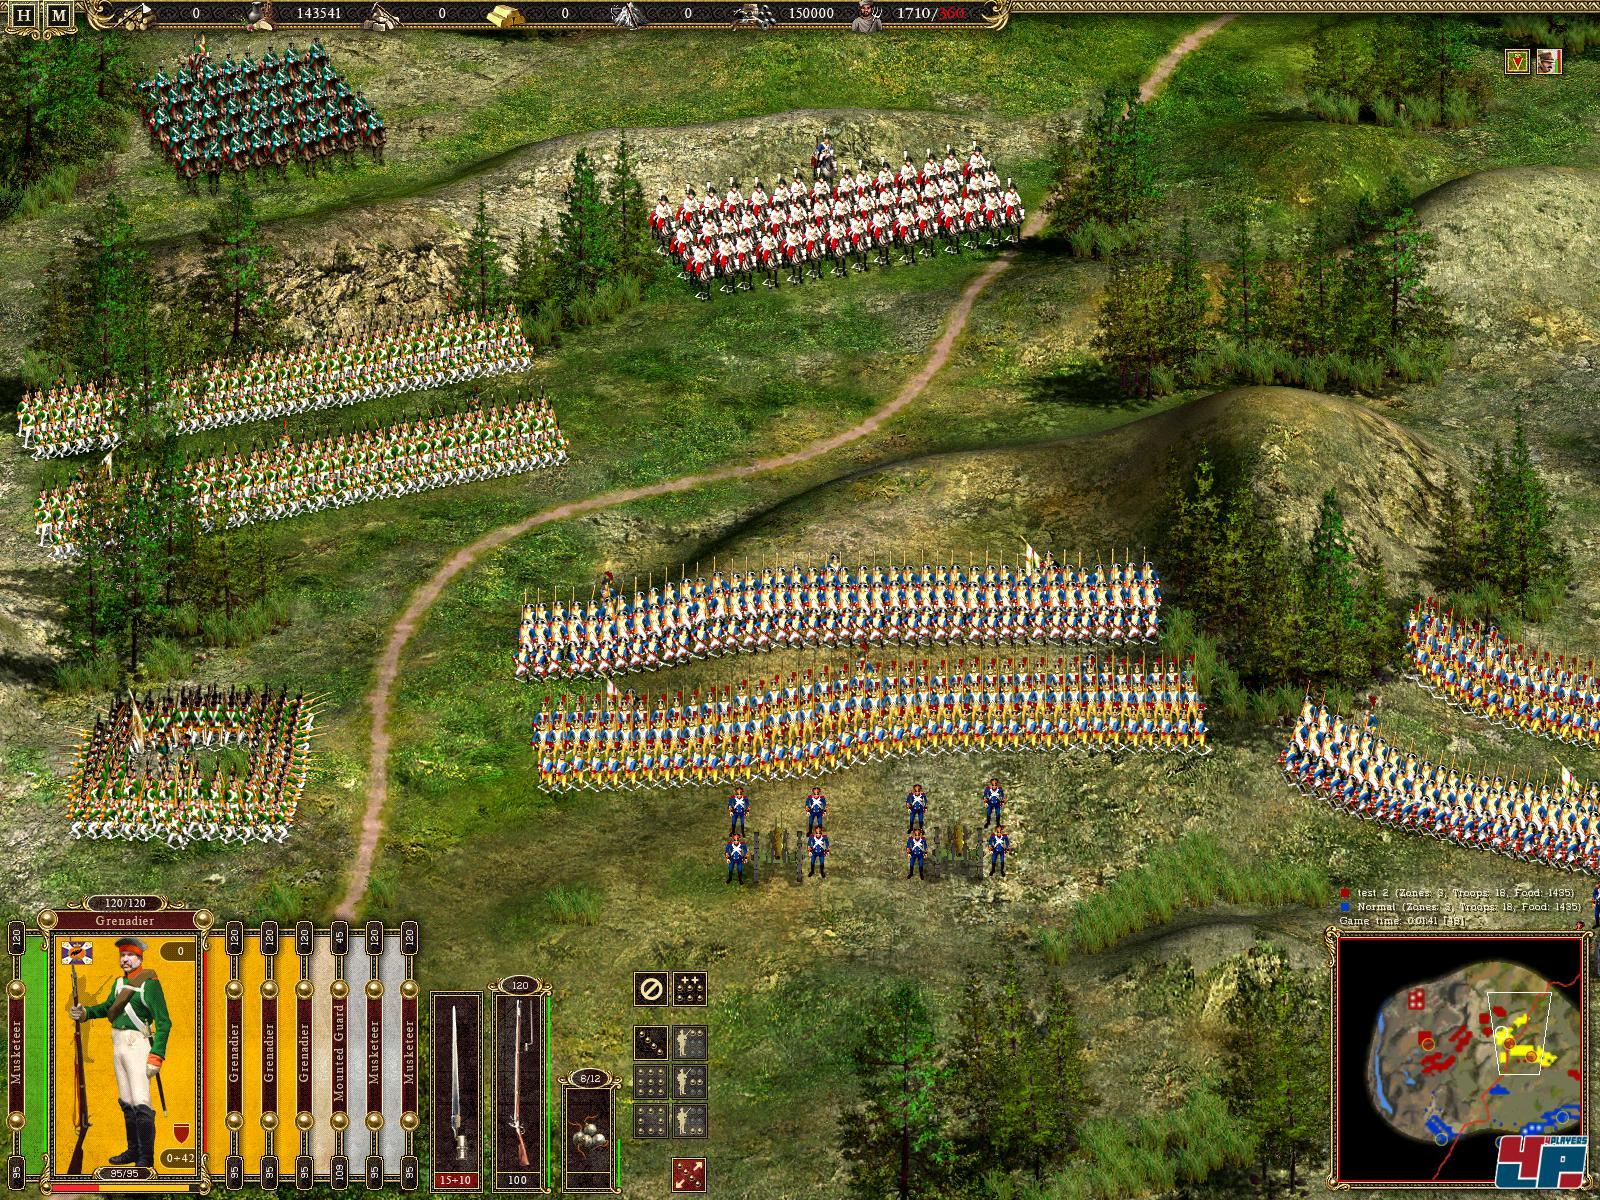 Скачать игру Казаки 2 Битва за Европу / Cossacks 2 The Battle for